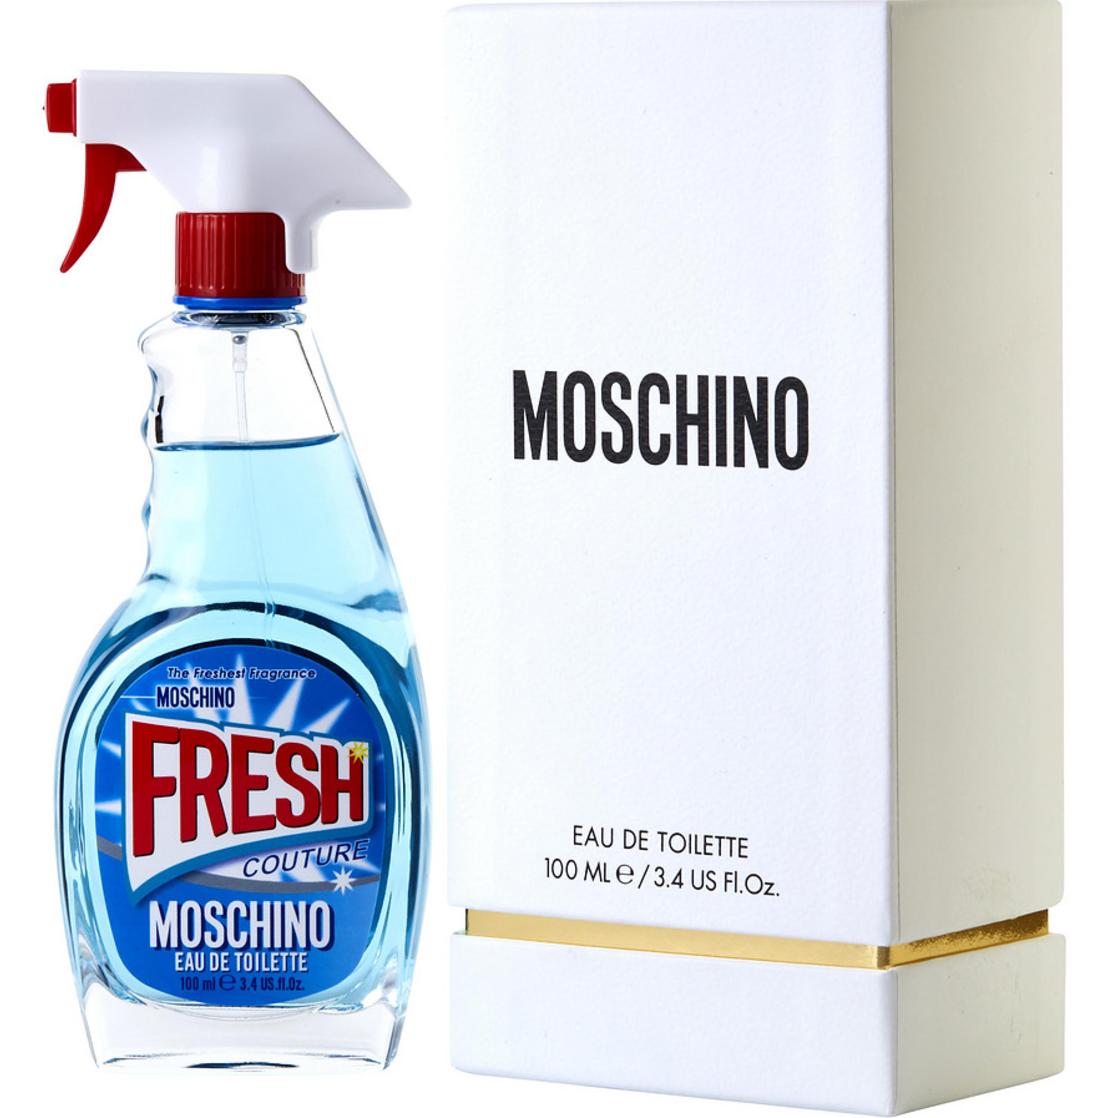 Moschino - Fresh Couture - eau de toilette